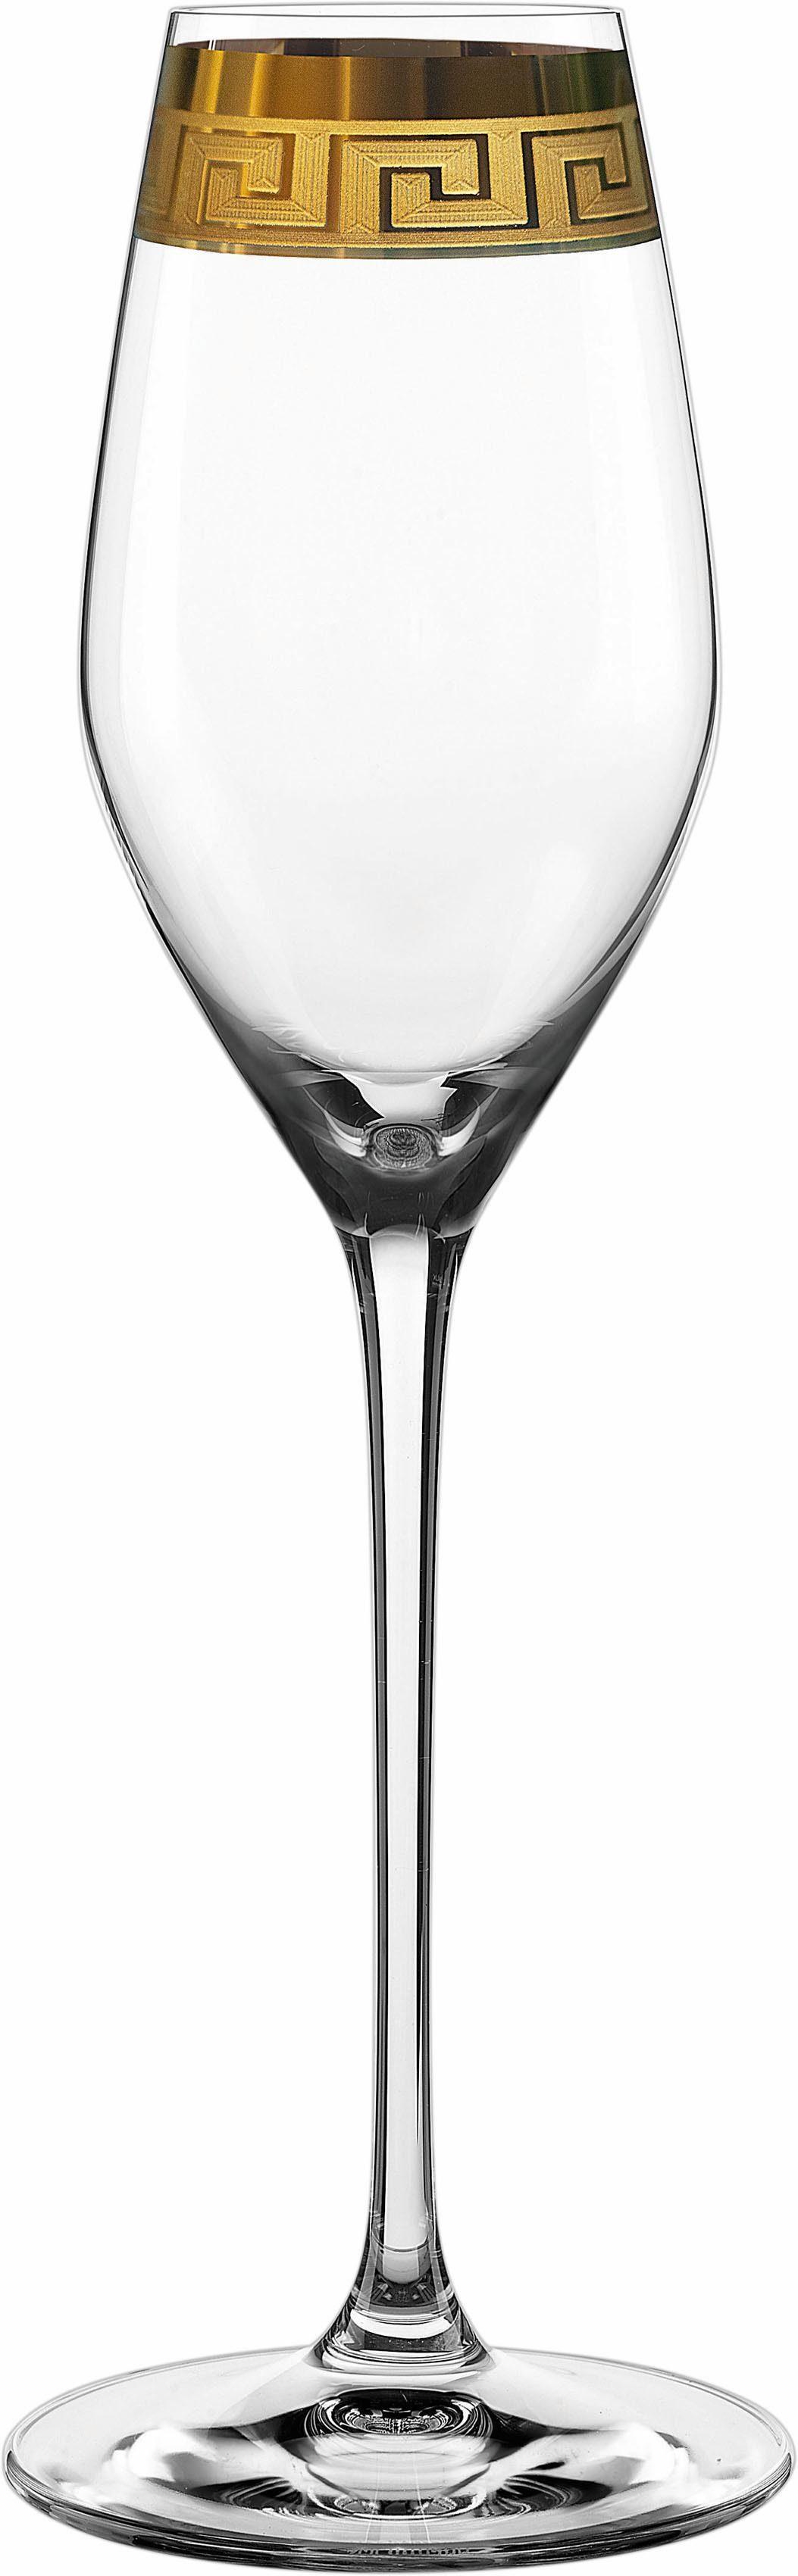 Nachtmann Champagnerglas, 2er Set, »MUSE«